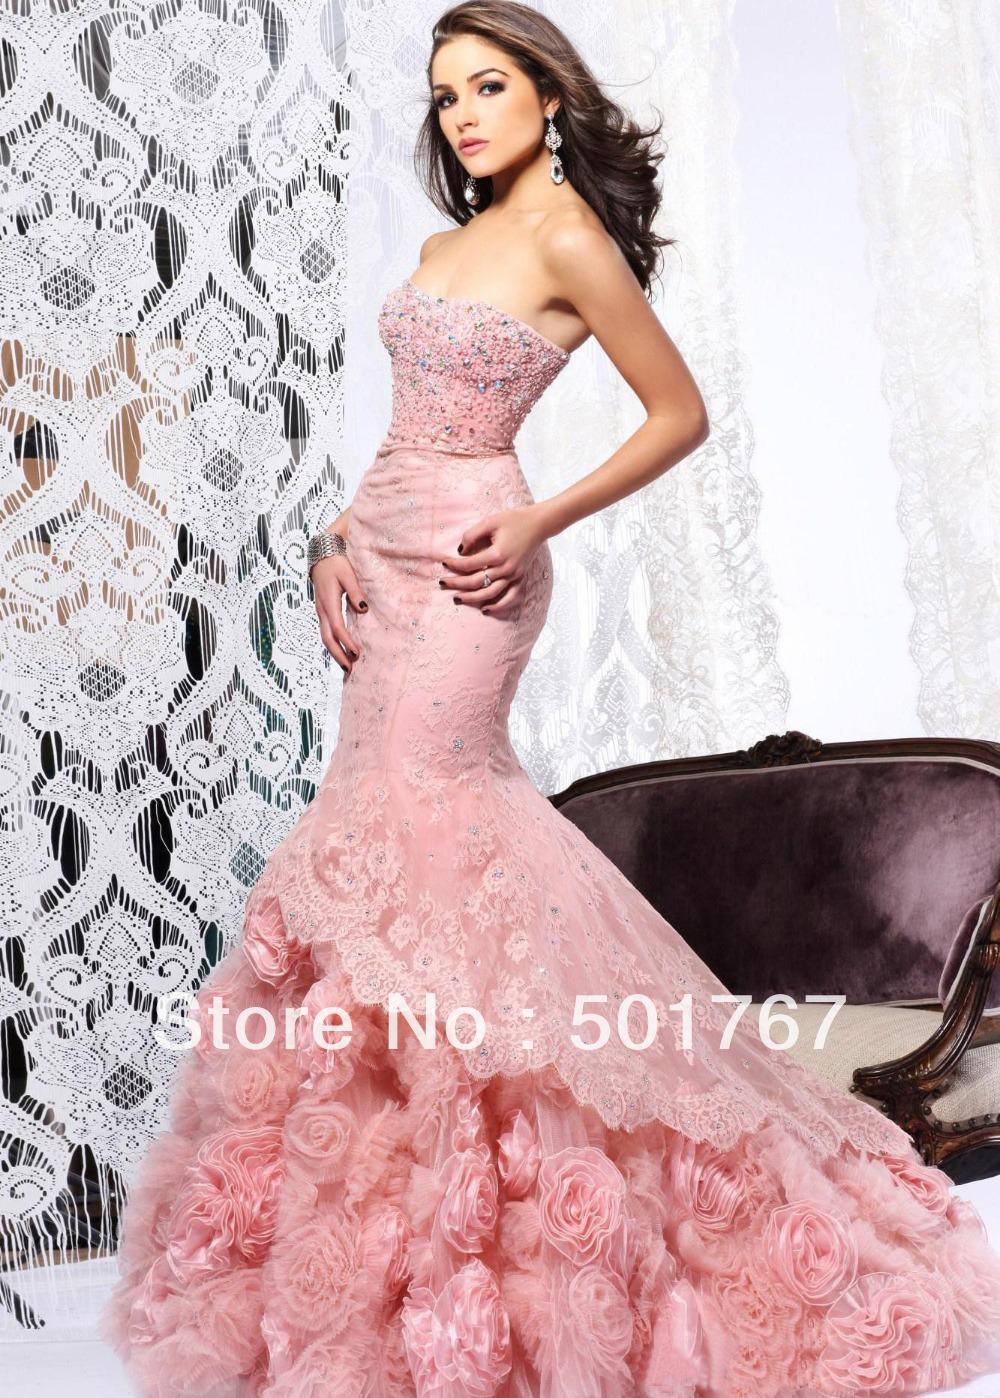 Lace Wedding Dresses China